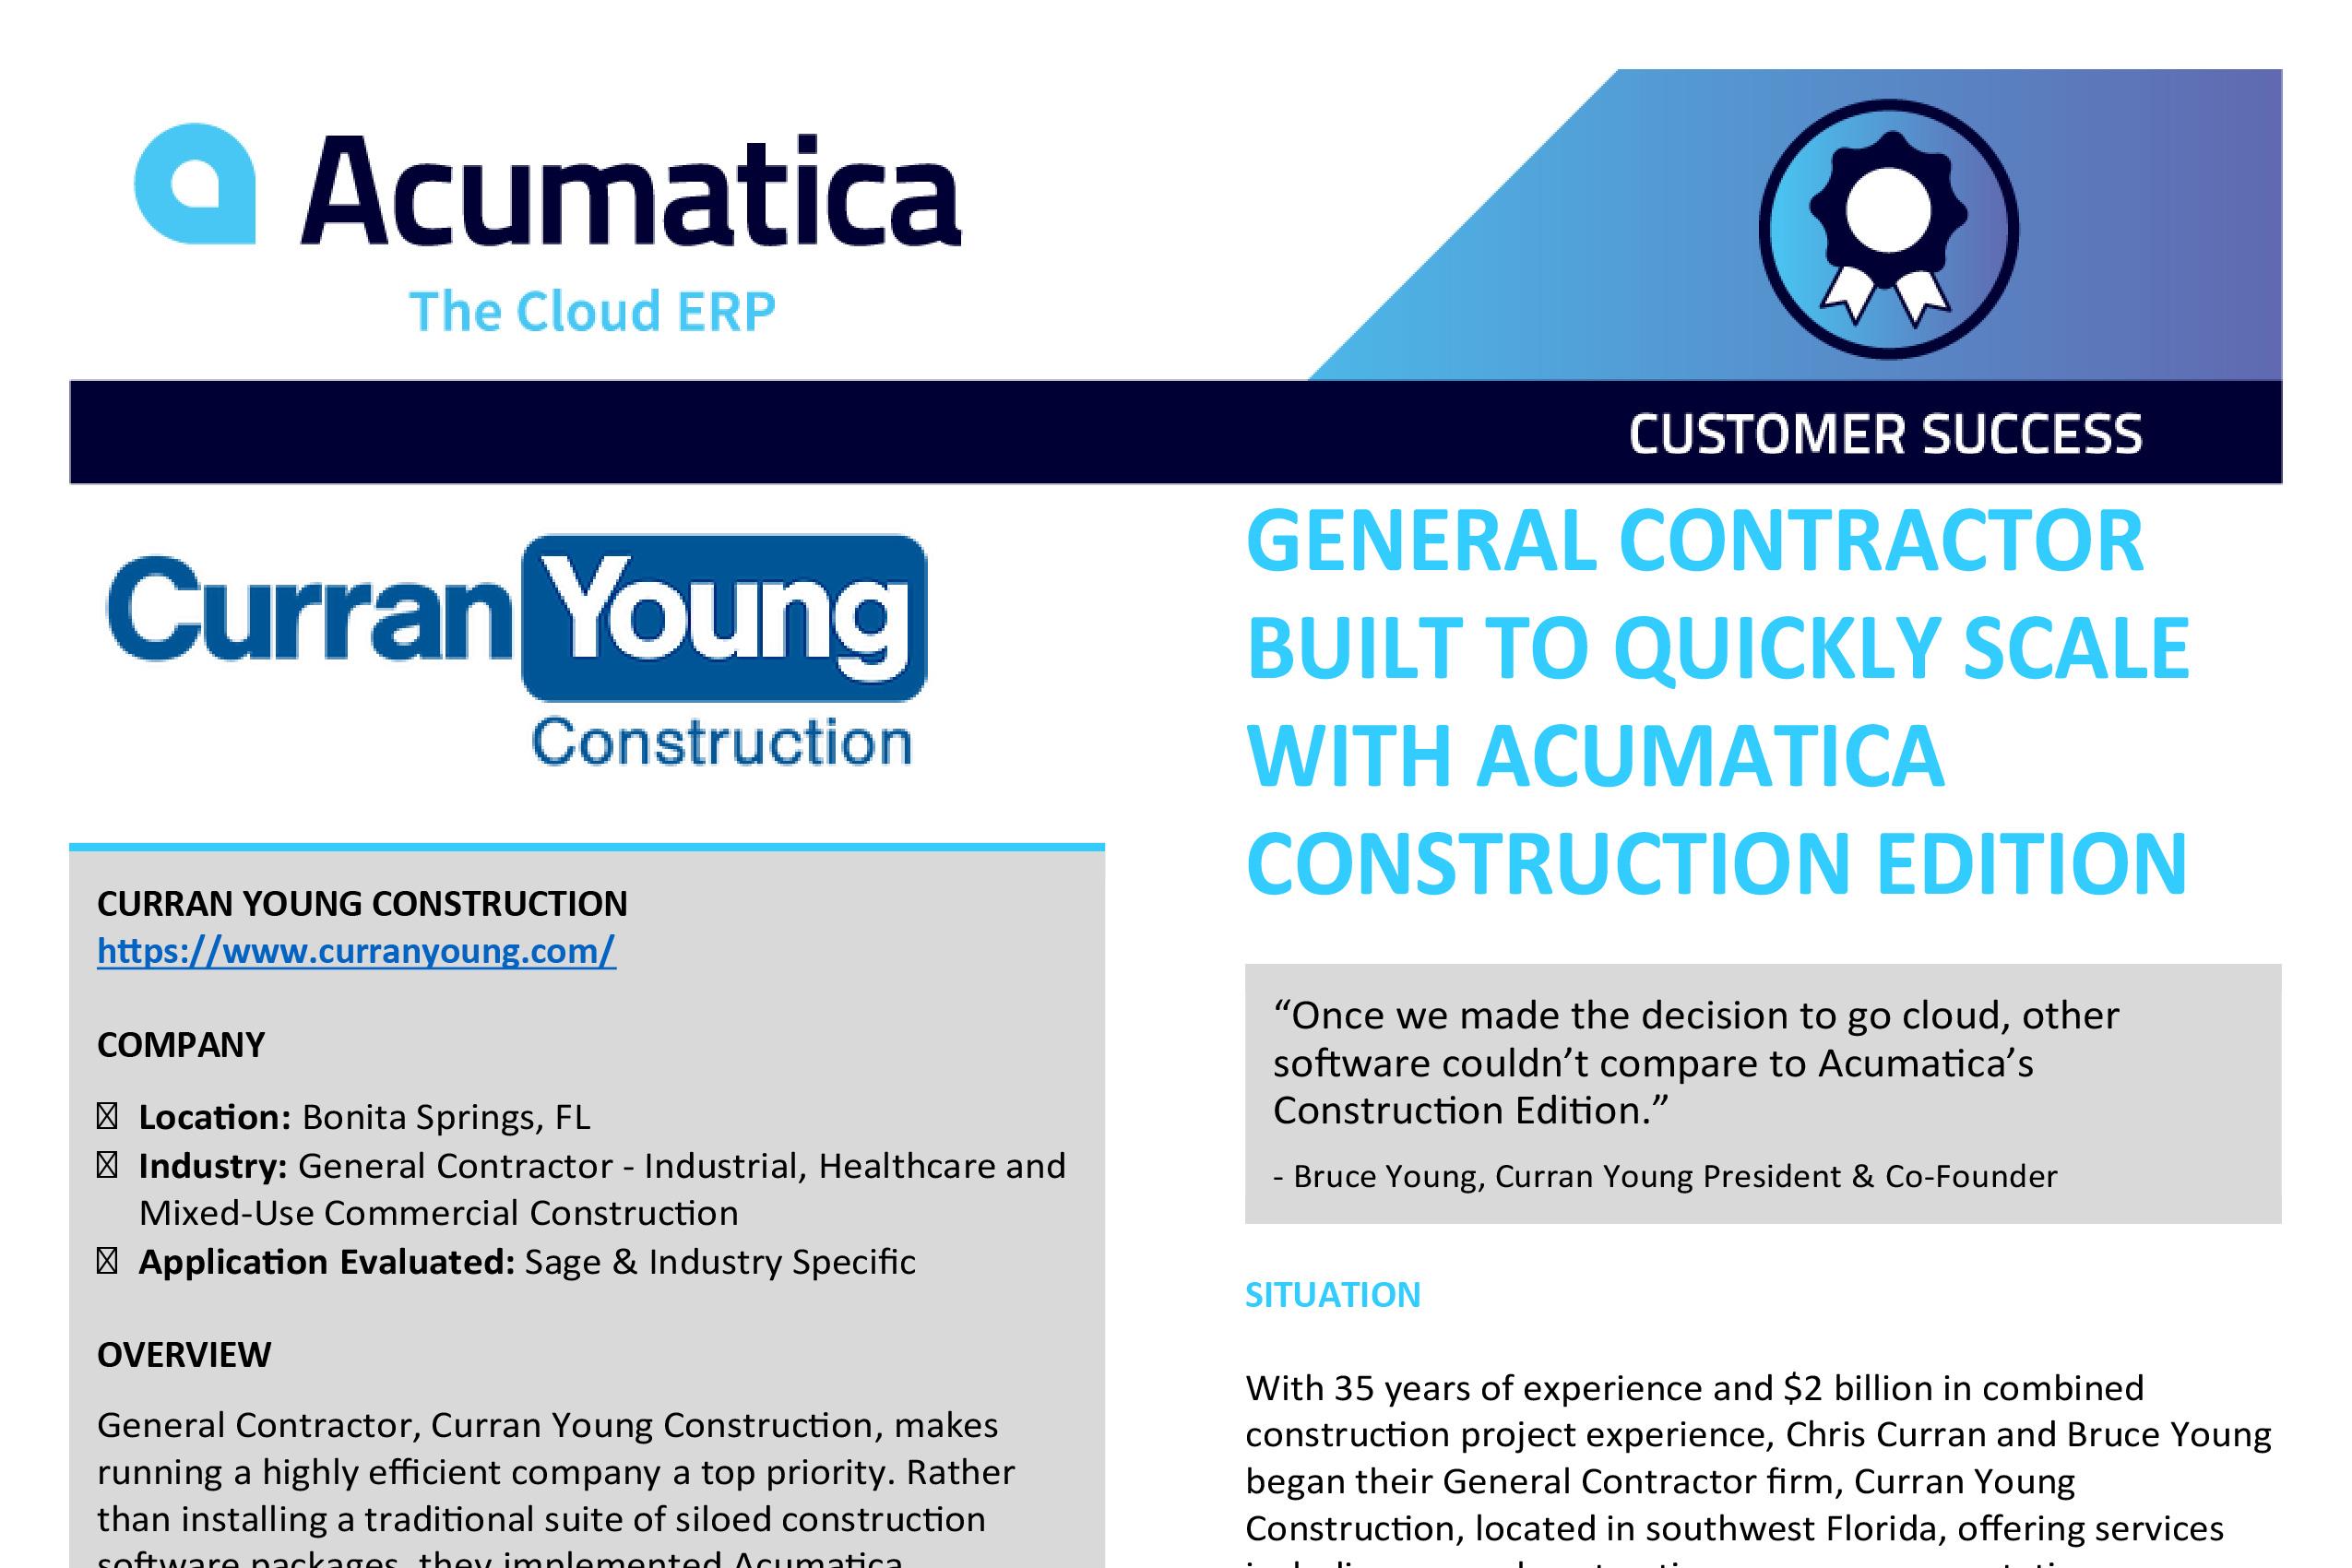 Acumatica_Customer_Success_Story_CurranYoung-01